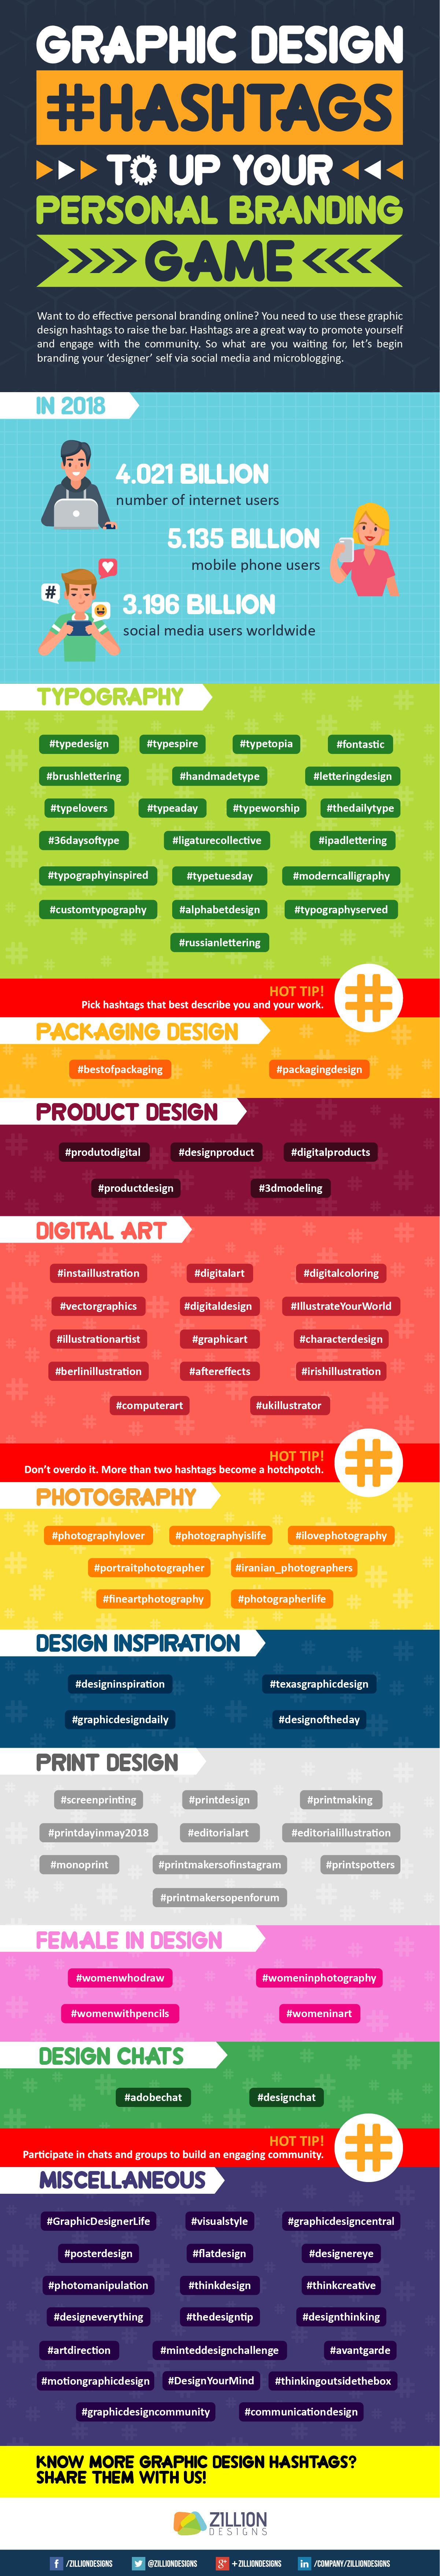 Graphic Design Hashtags